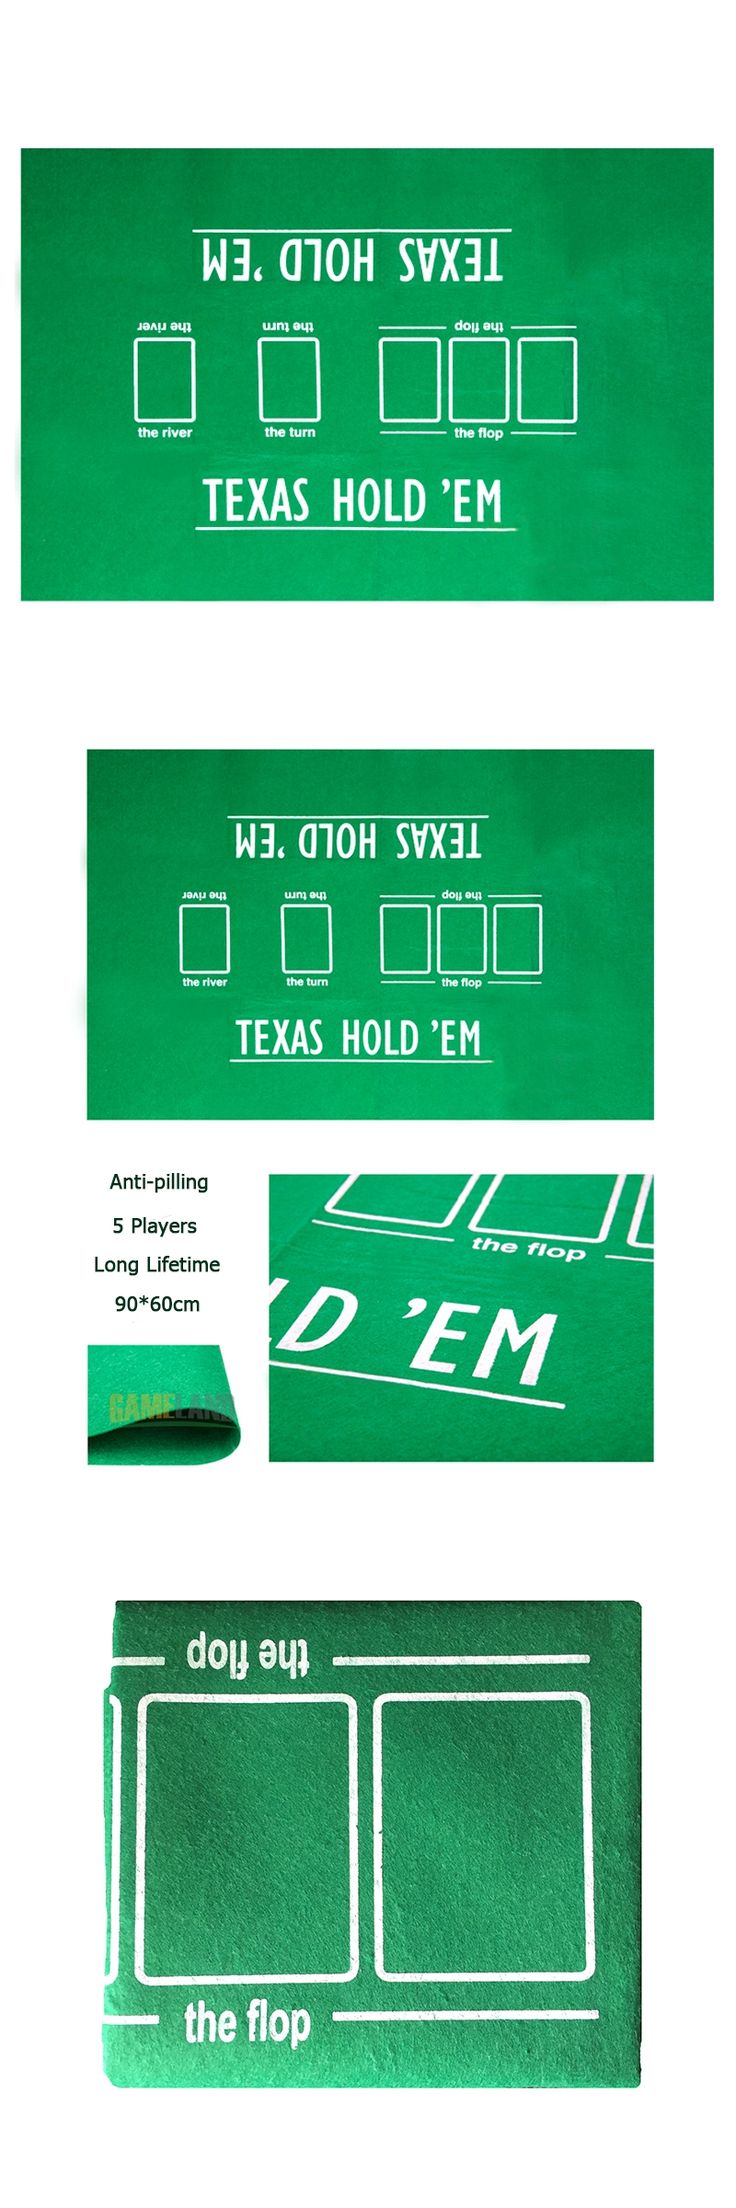 New Year - 60*90cm 5 Players Anti-pilling Texas Hold'em Poker Table Cloth Poker Set Fichas Fietro Felt Board Cloth